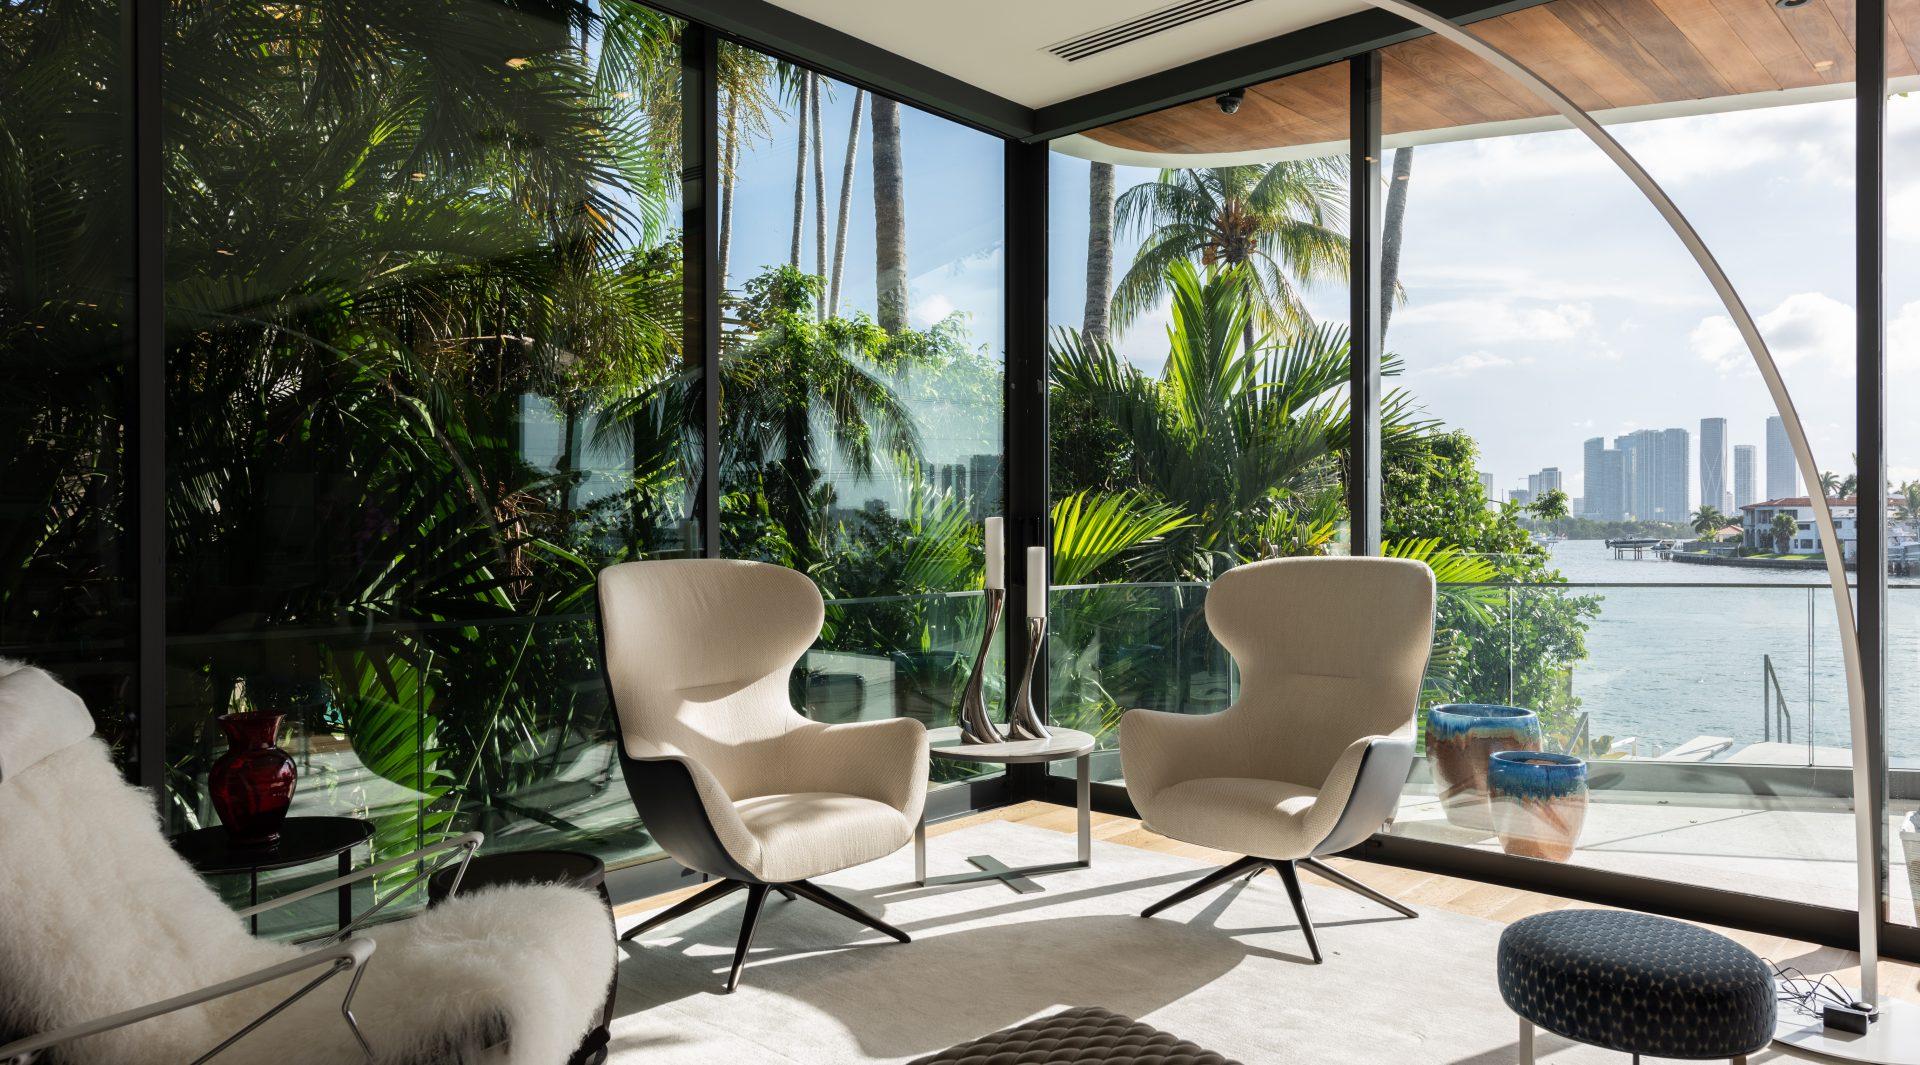 Michel Colaço Interior Architecture and Design